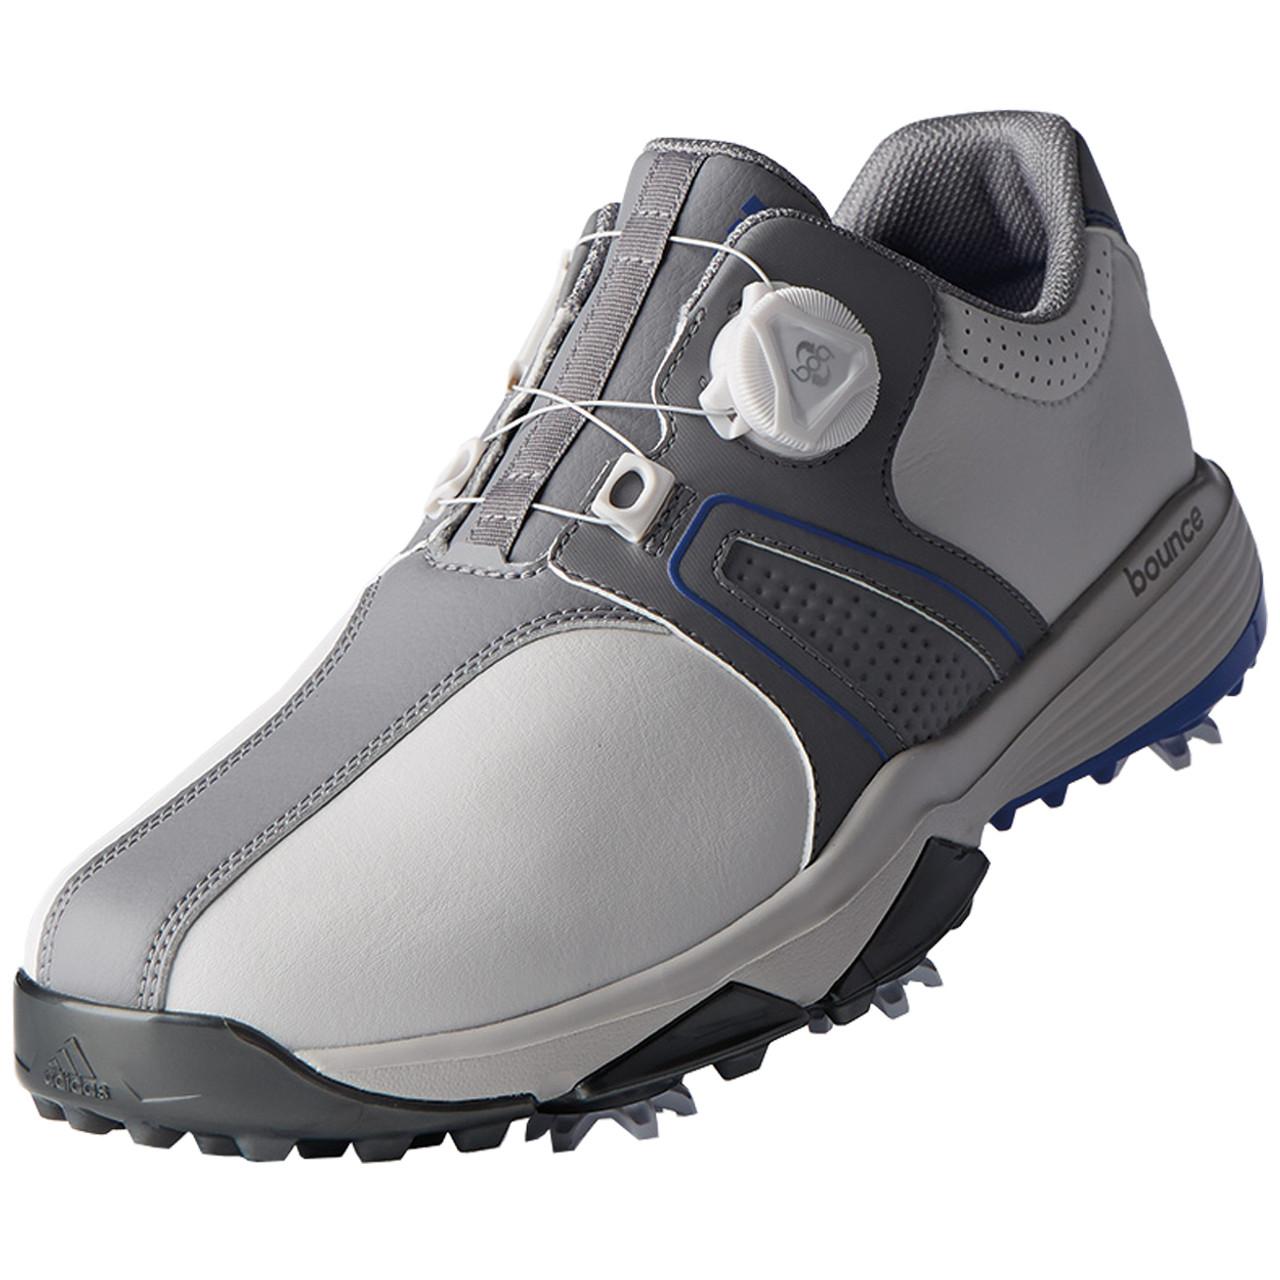 bibliotecario siglo Popa  Adidas 360 Traxion Golf Shoes with Boa Closure - GolfEtail.com